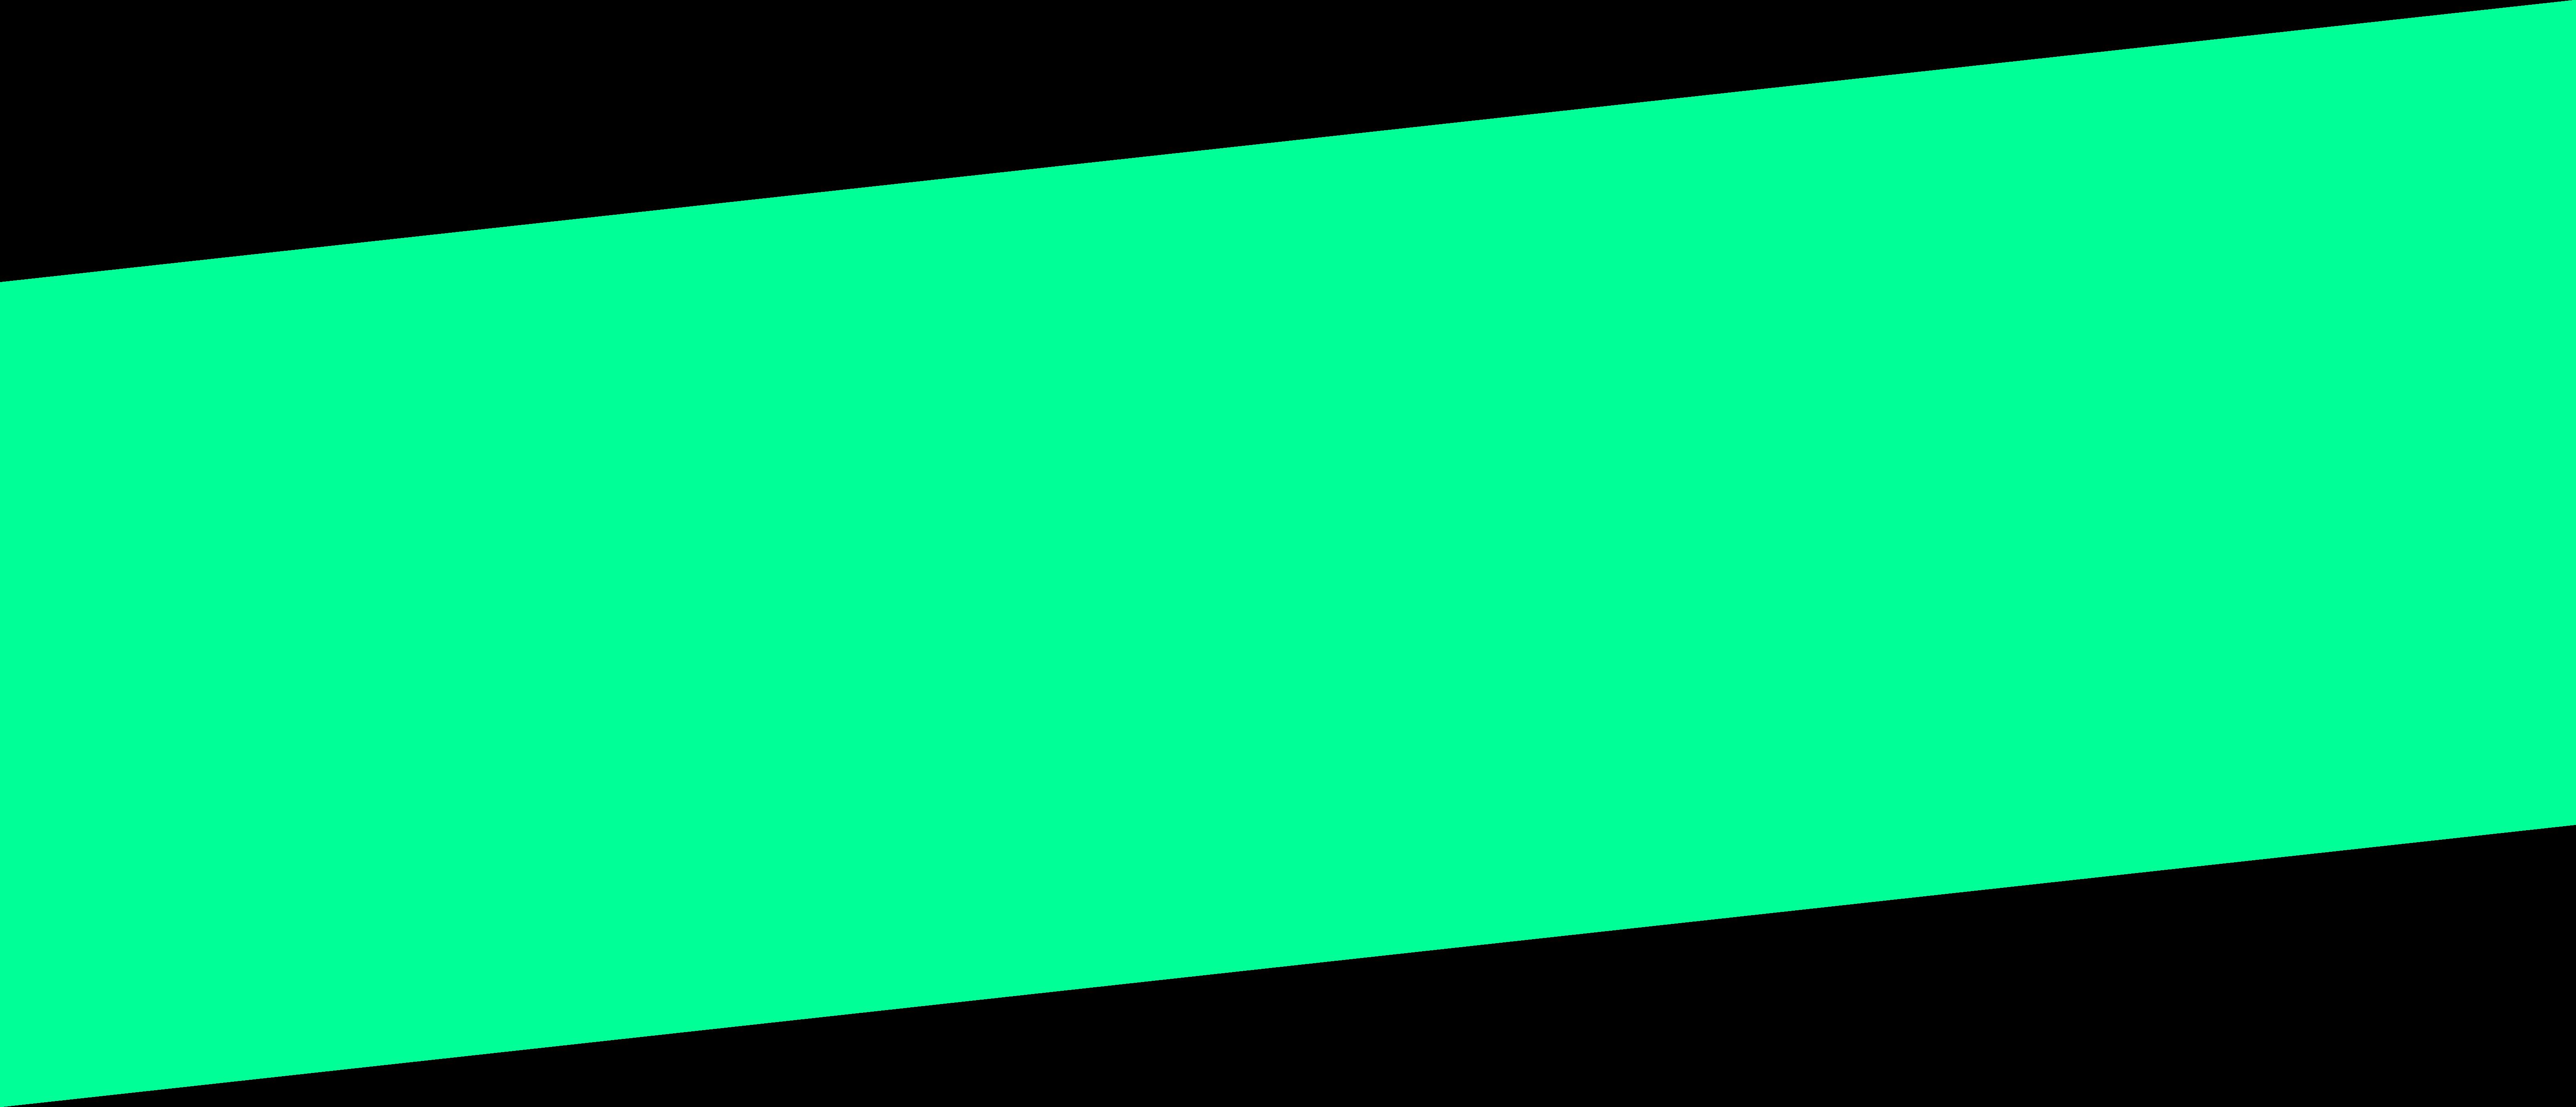 00_element_background_bar01